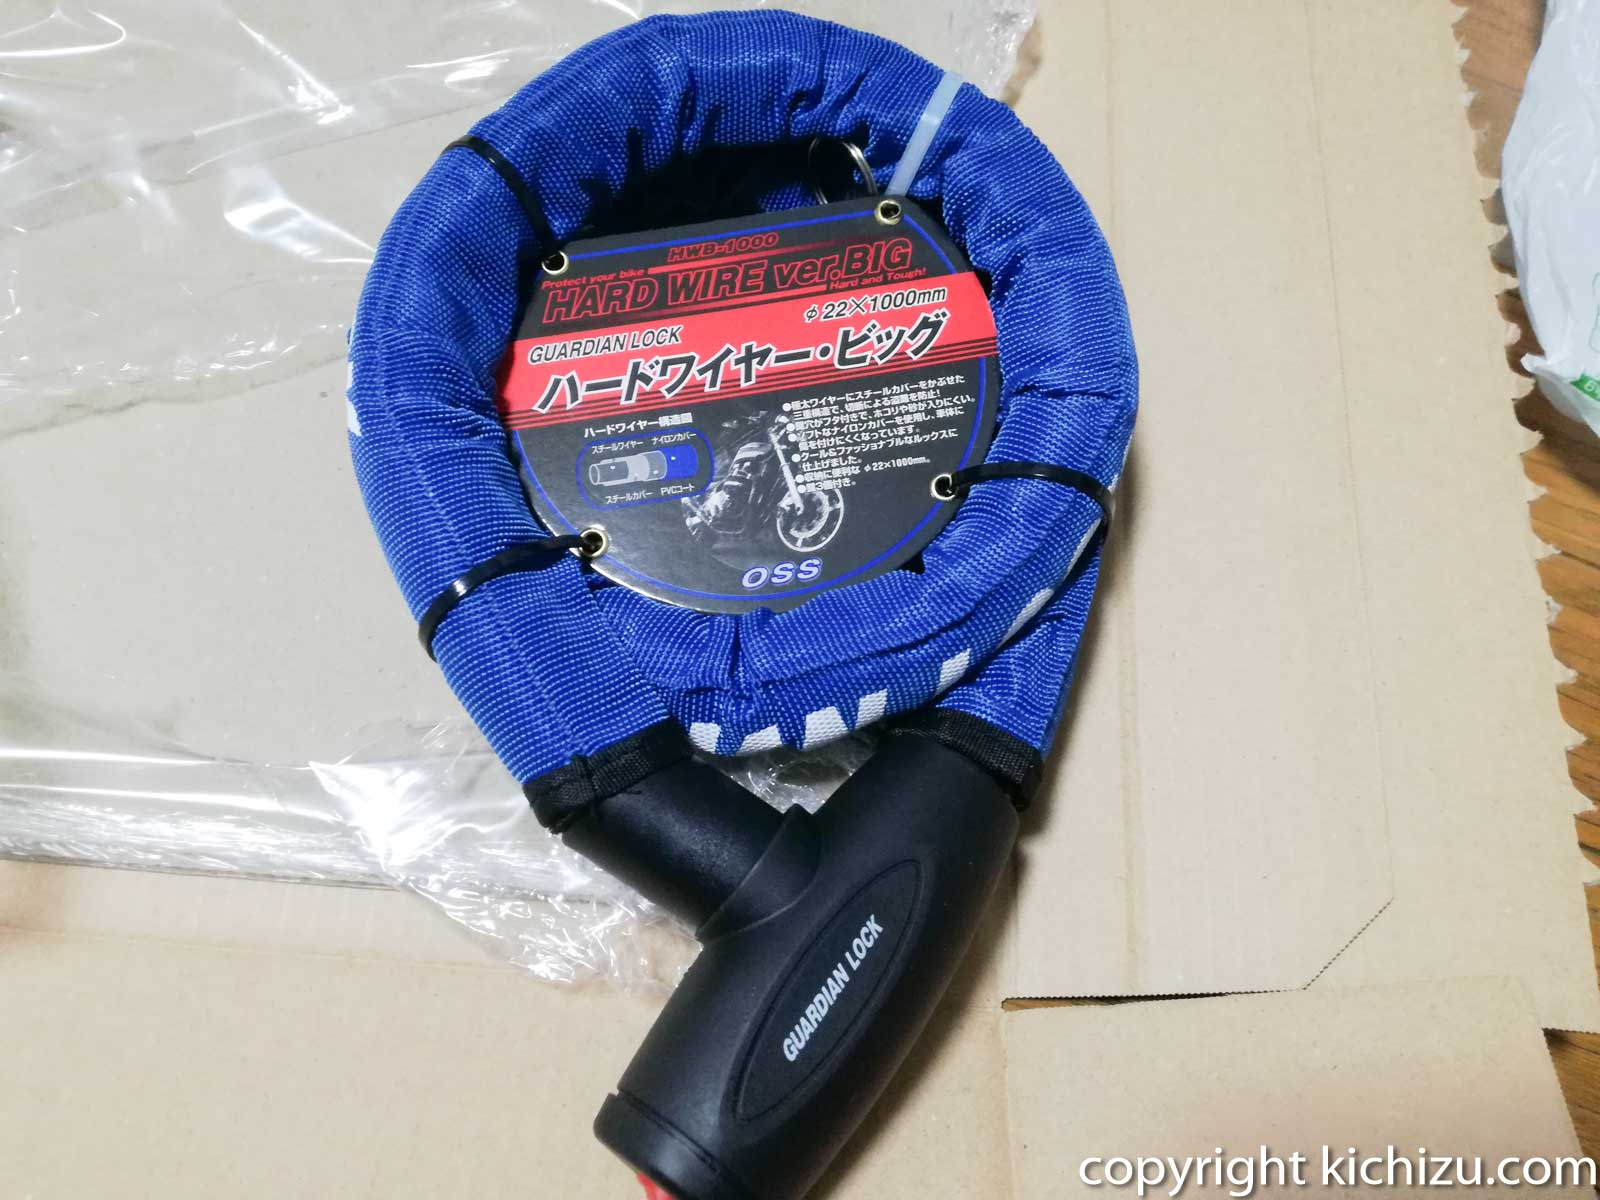 OSS ( 大阪繊維資材 ) ワイヤーロック GUARDIAN LOCK ハードワイヤー・ビッグ Blue HWB-1000